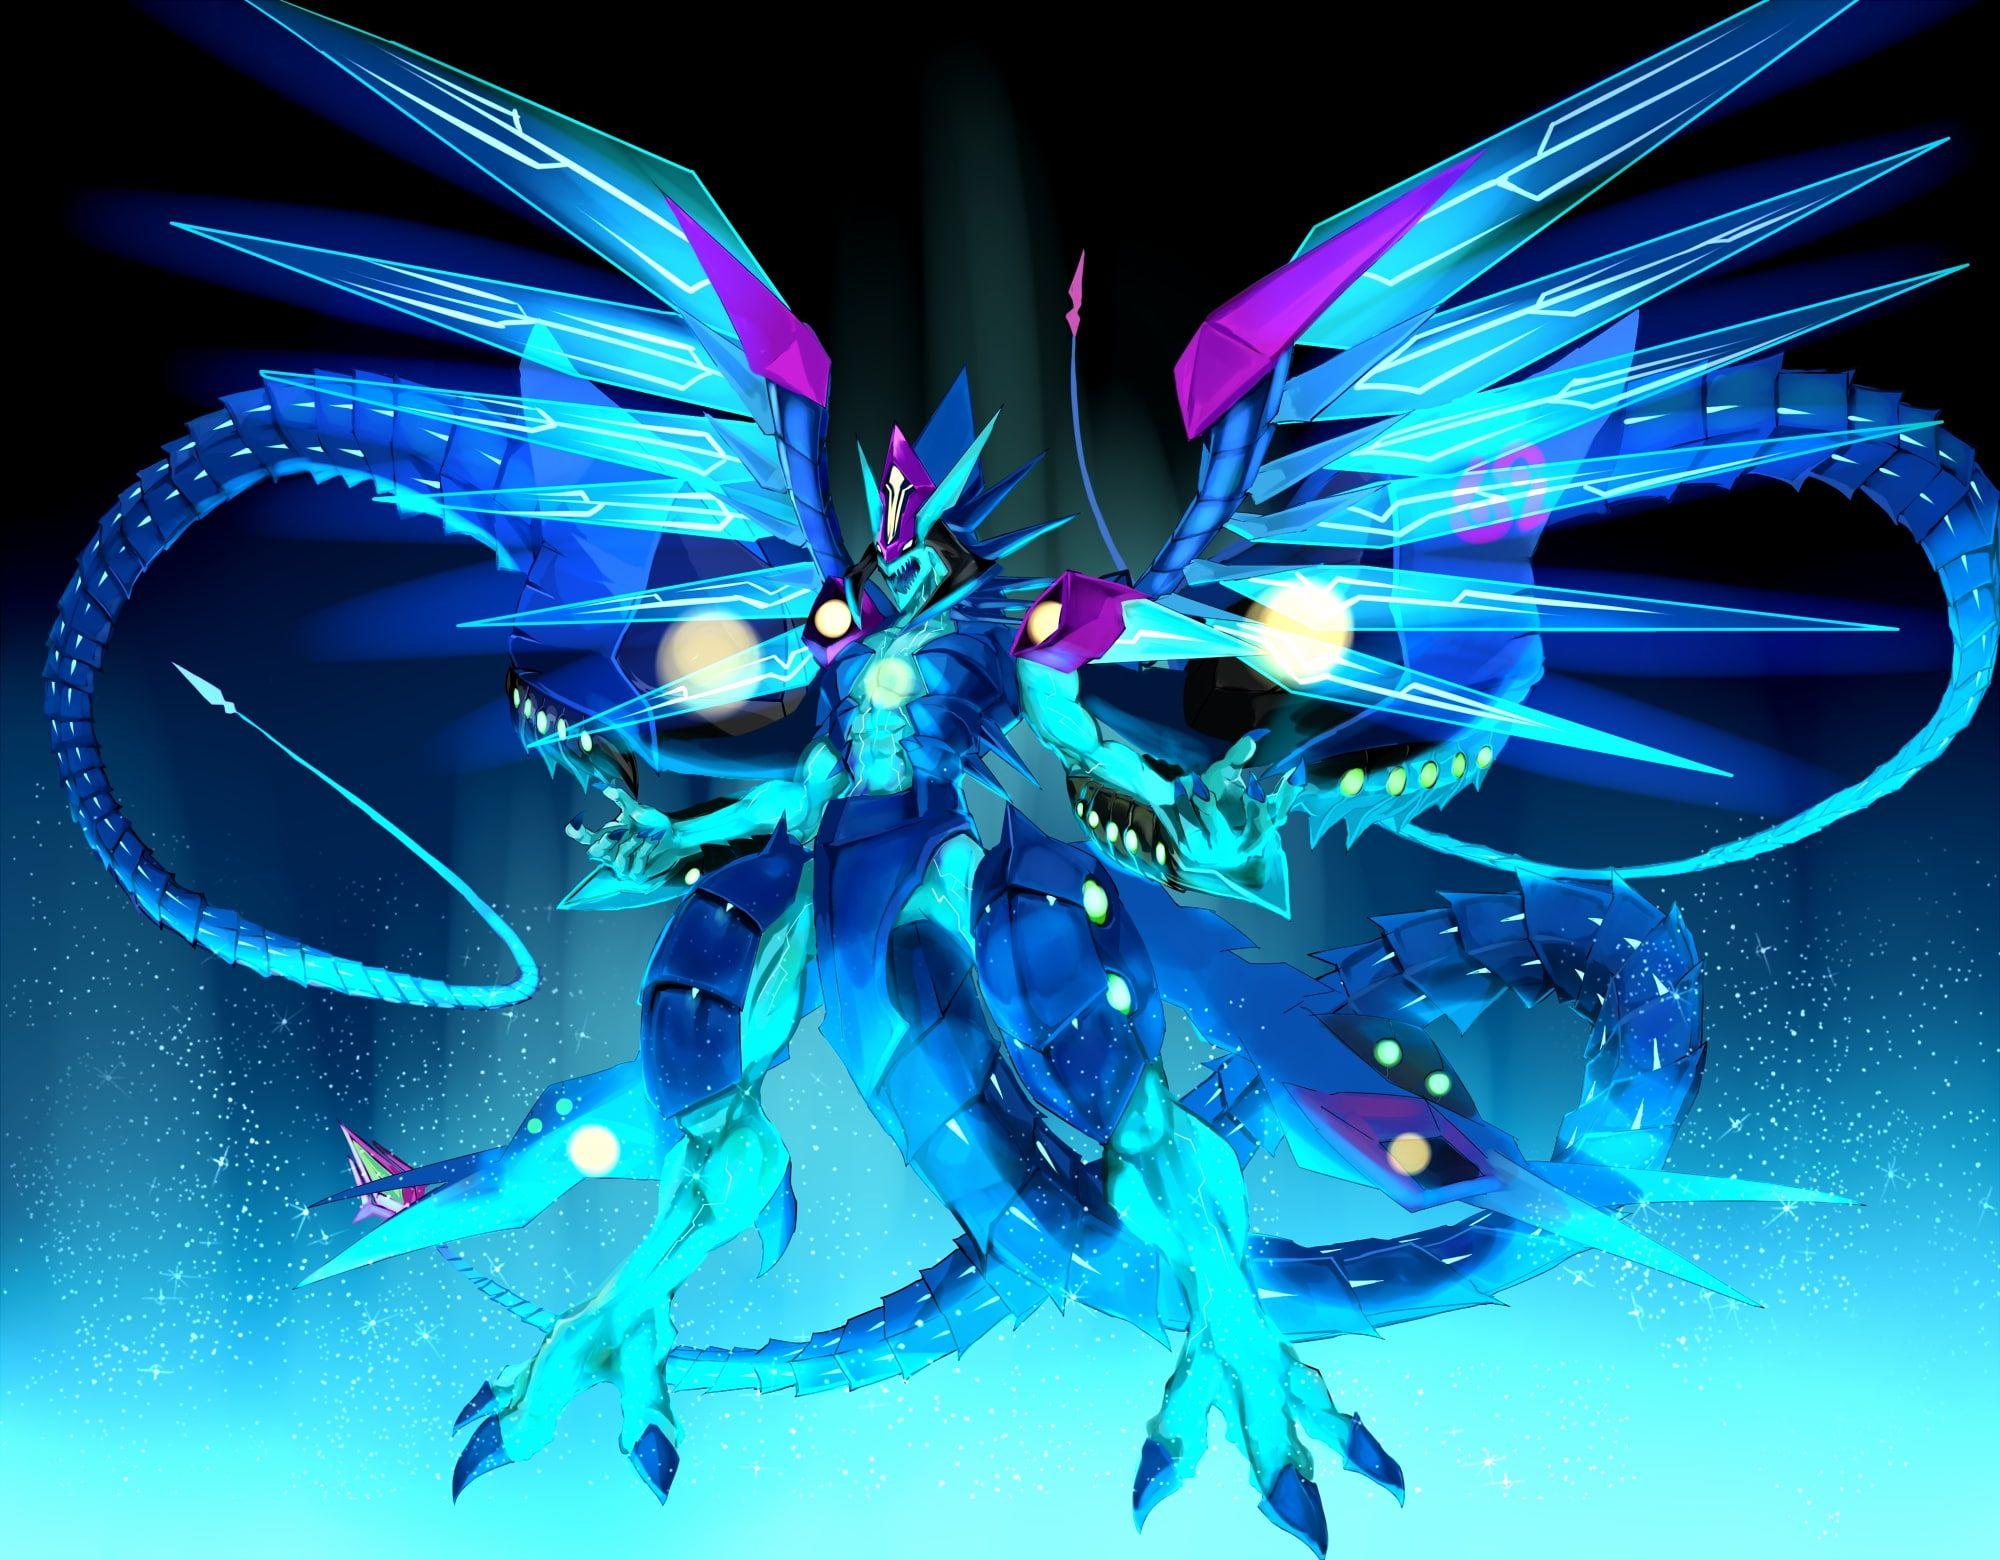 Yu Gi Oh Zexal Galaxy Eyes Prime Photon Dragon Anime 1080p Wallpaper Hdwallpaper Desktop Galaxy Eyes Anime Yugioh